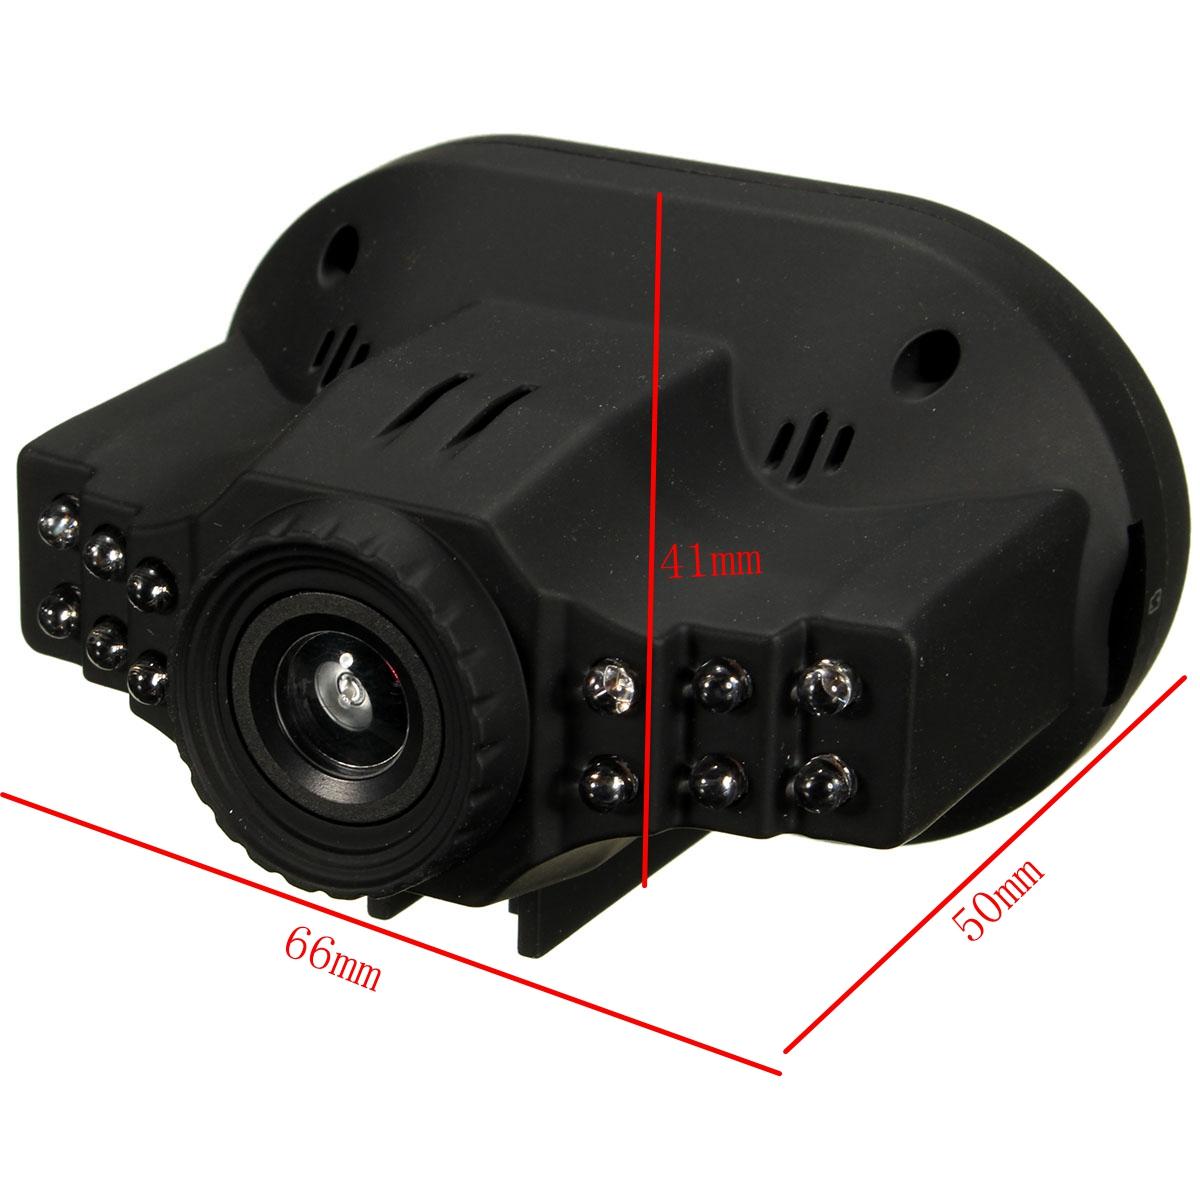 Hks Car Full Hd 120 1080p Dvr Vehicle Cam Camera Video